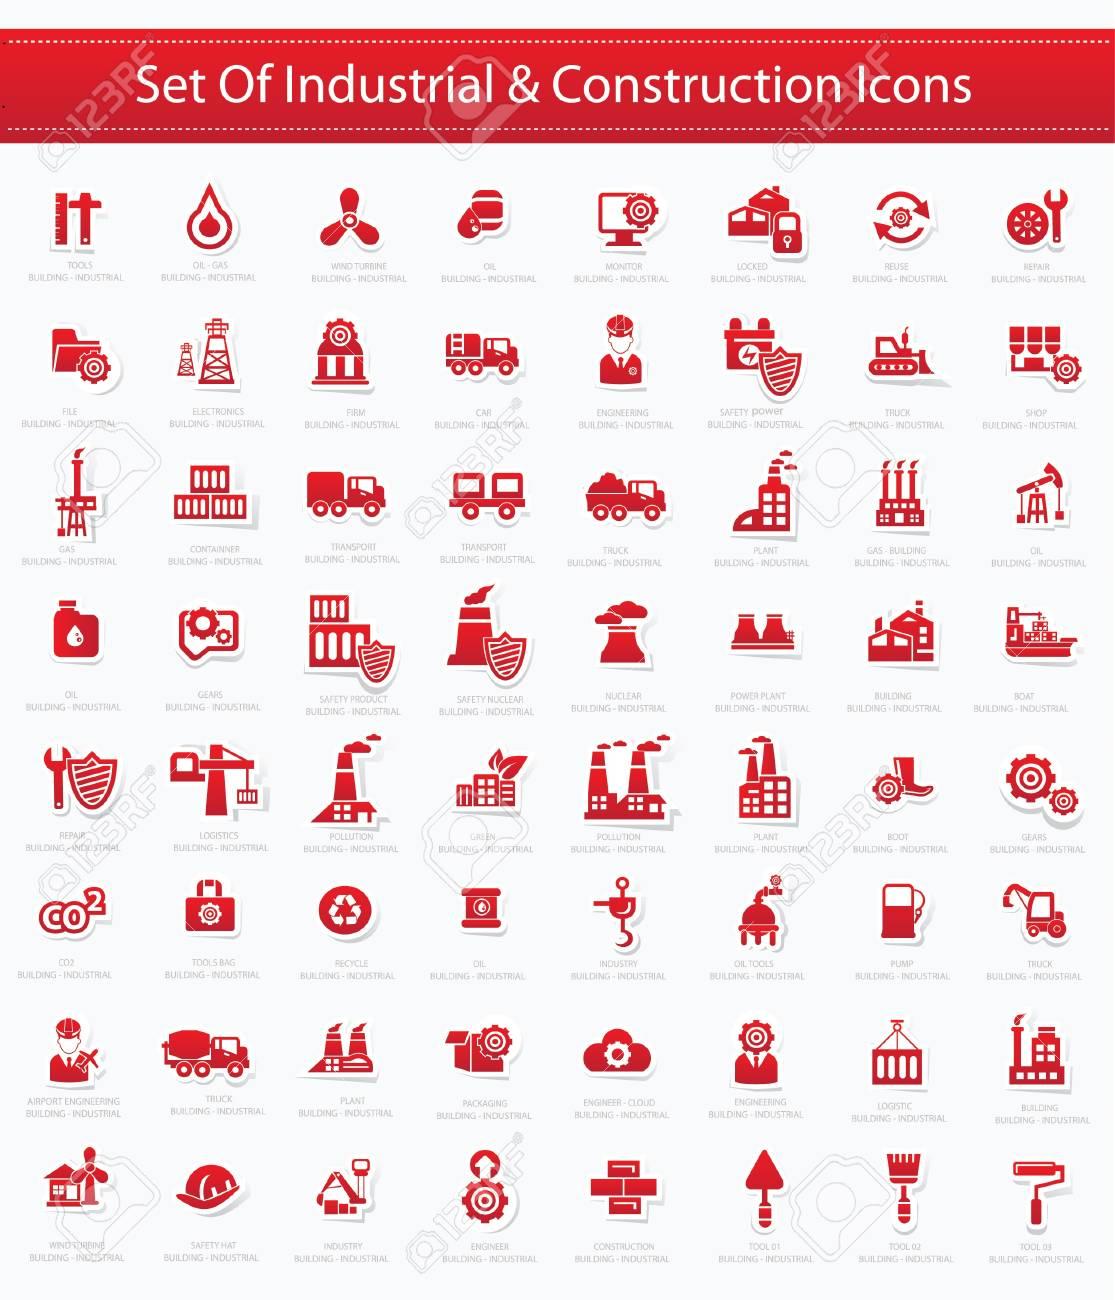 Industrial icon set,Red version,vector Stock Vector - 22098265